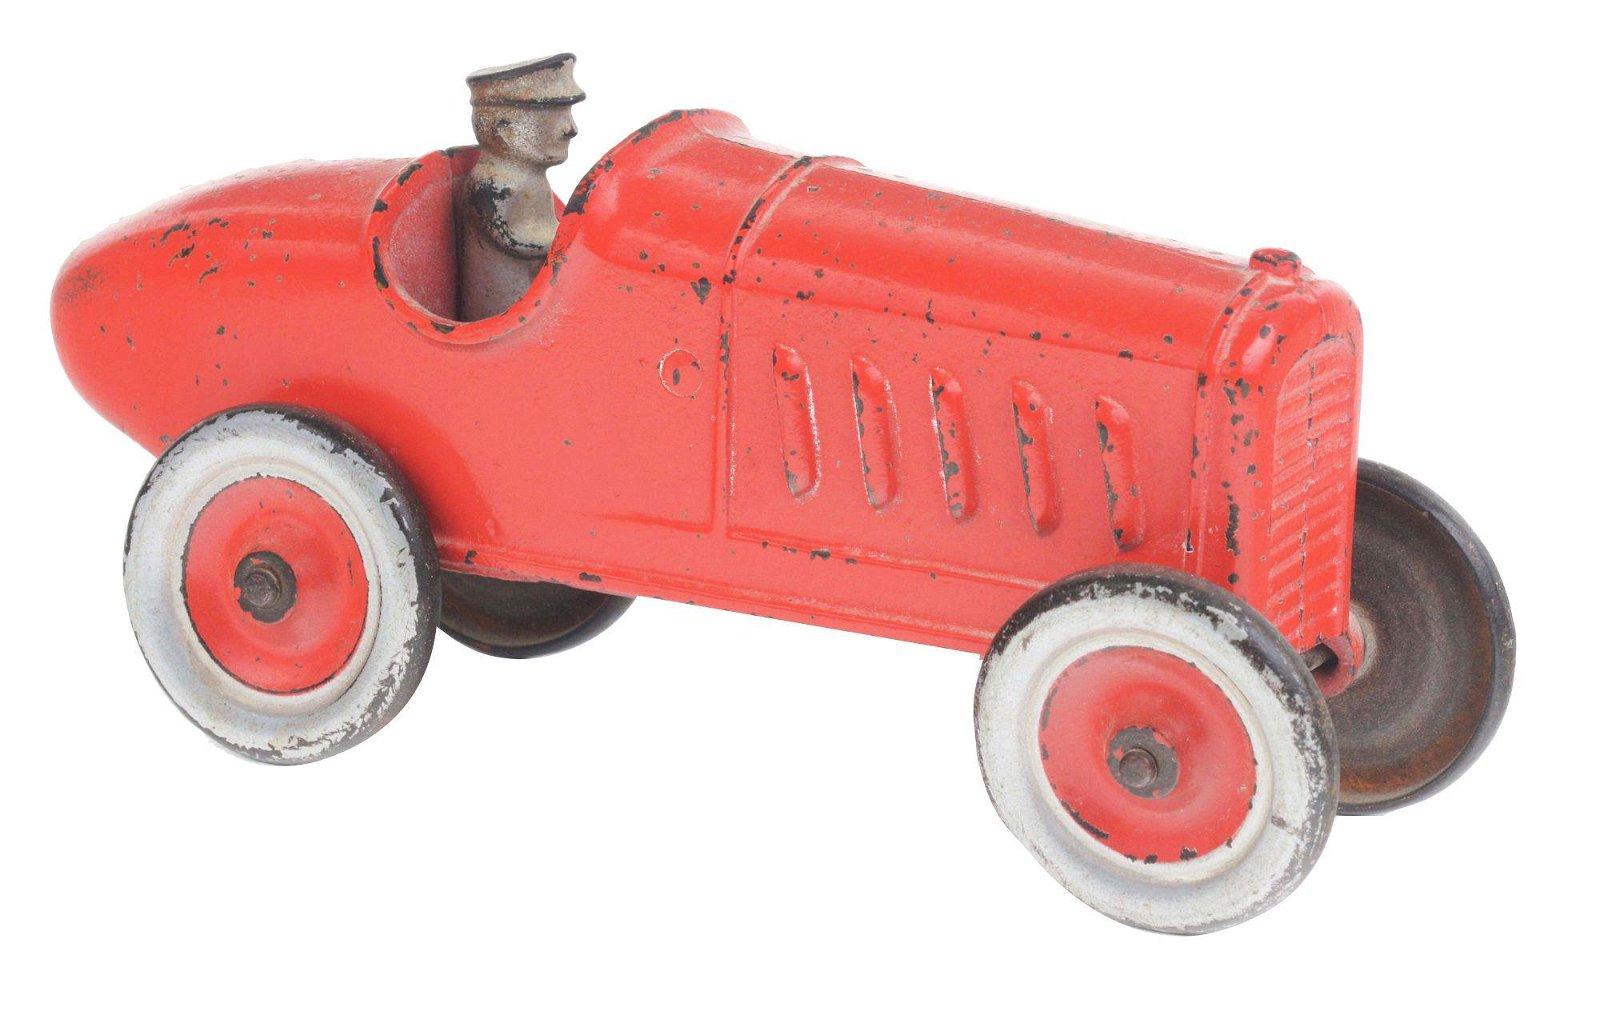 EARLY KENTON CAST IRON RACE CAR.